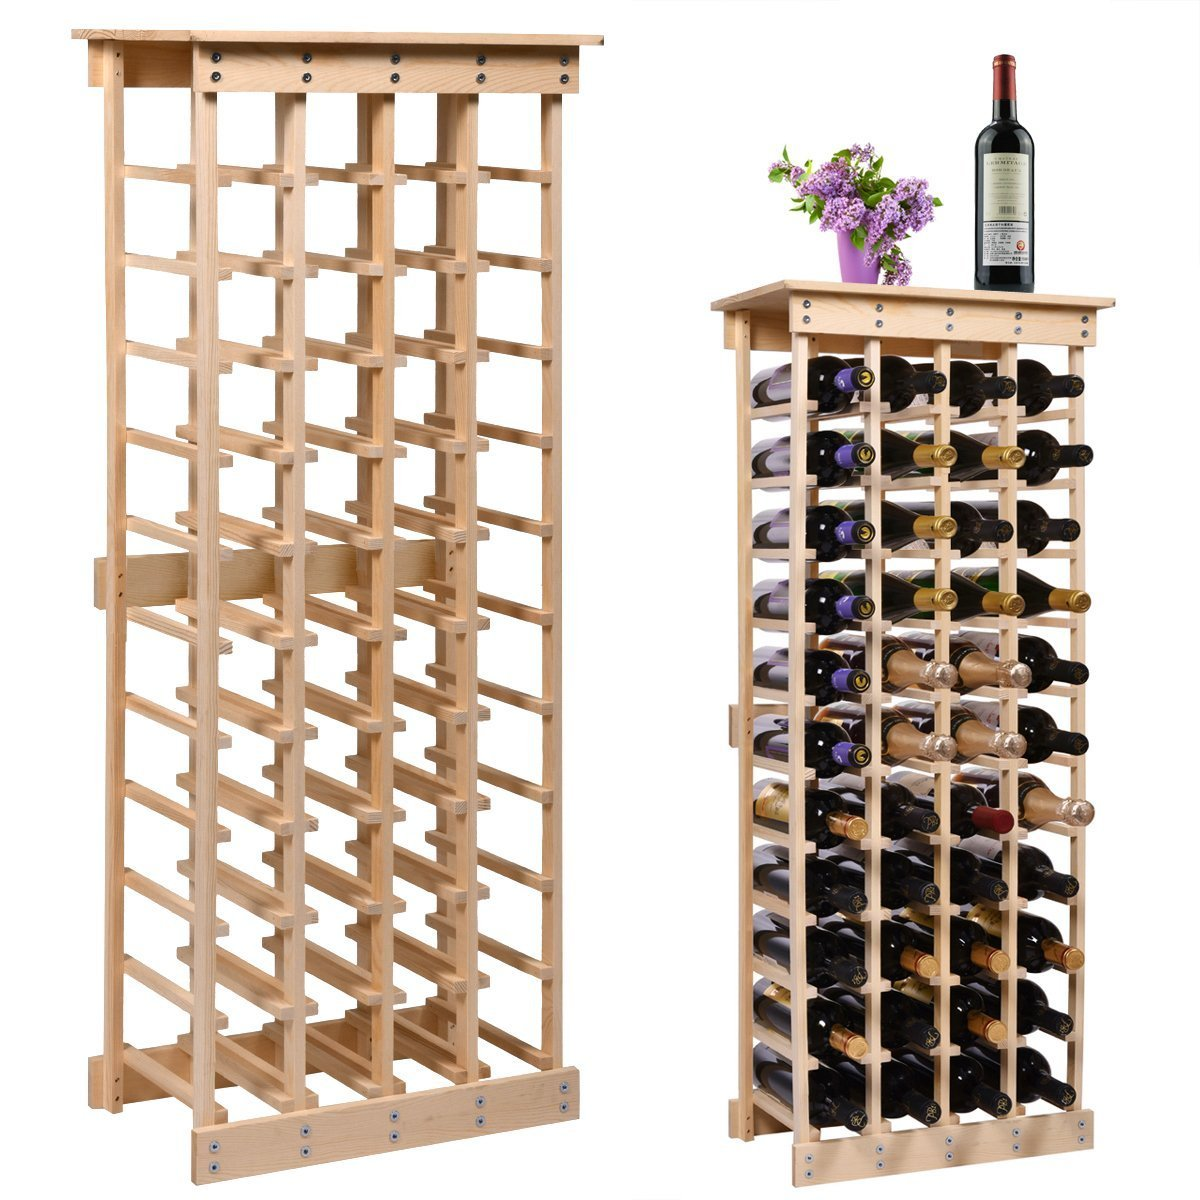 LAZYMOON 44 Bottle Wood Wine Rack Storage Display Shelves Kitchen Decor Natural